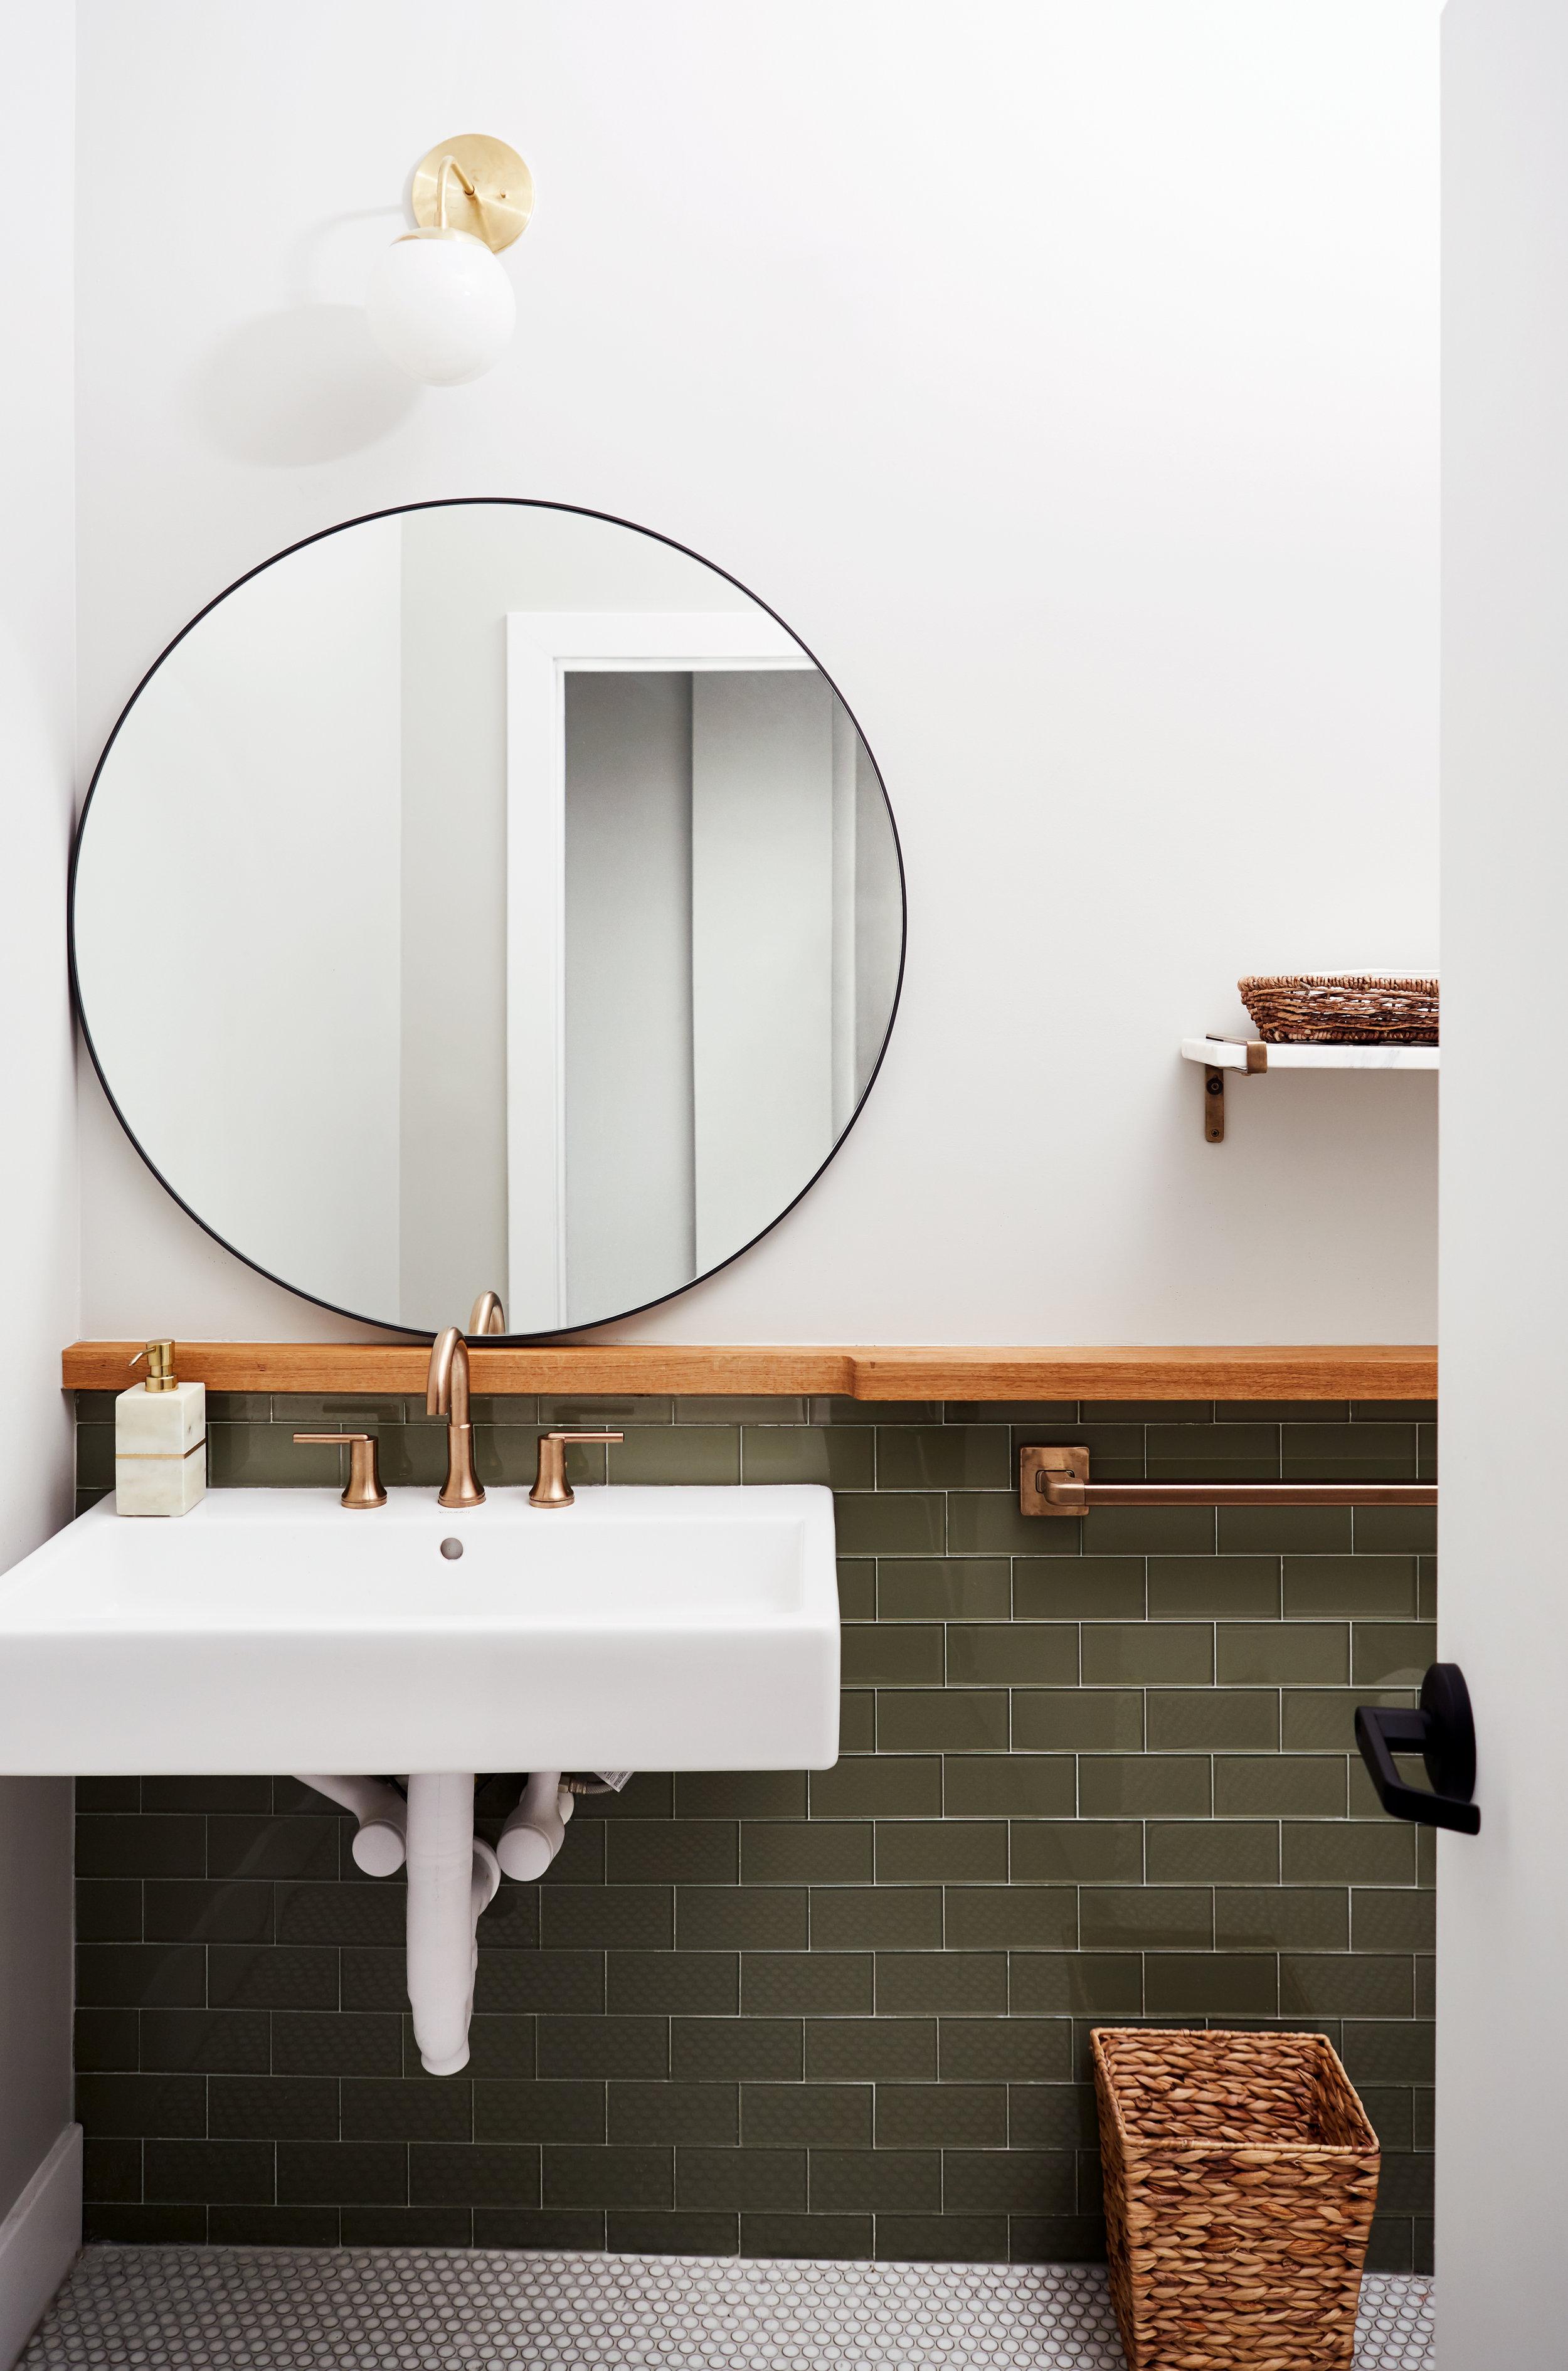 04_Bathroom_111 copy.jpg